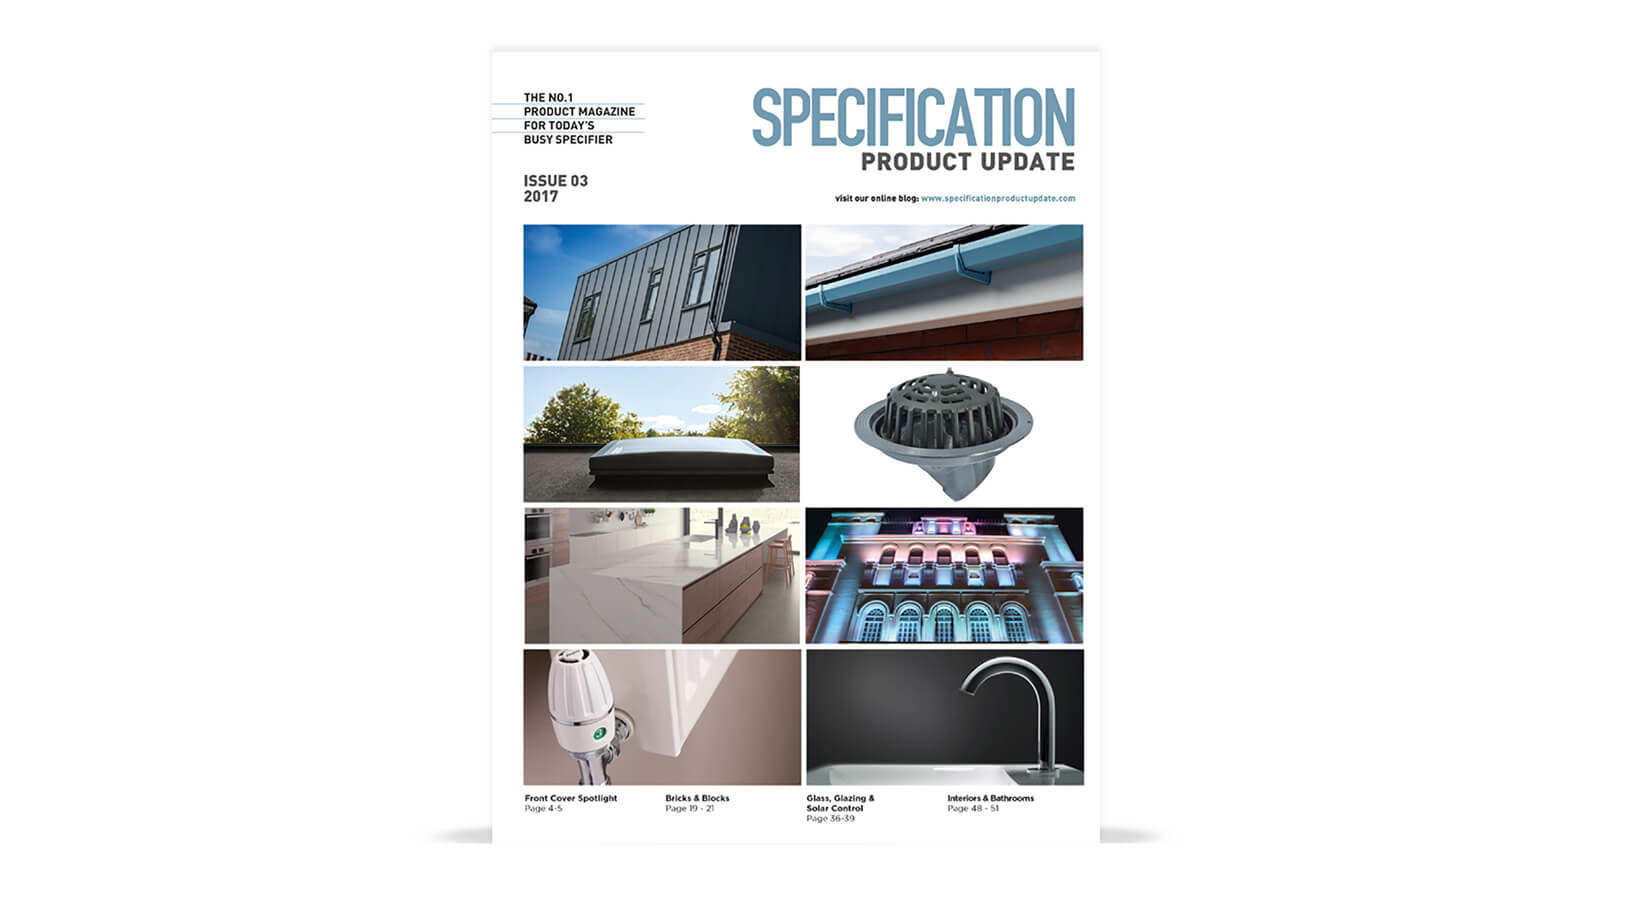 specification product update magazine tsp media